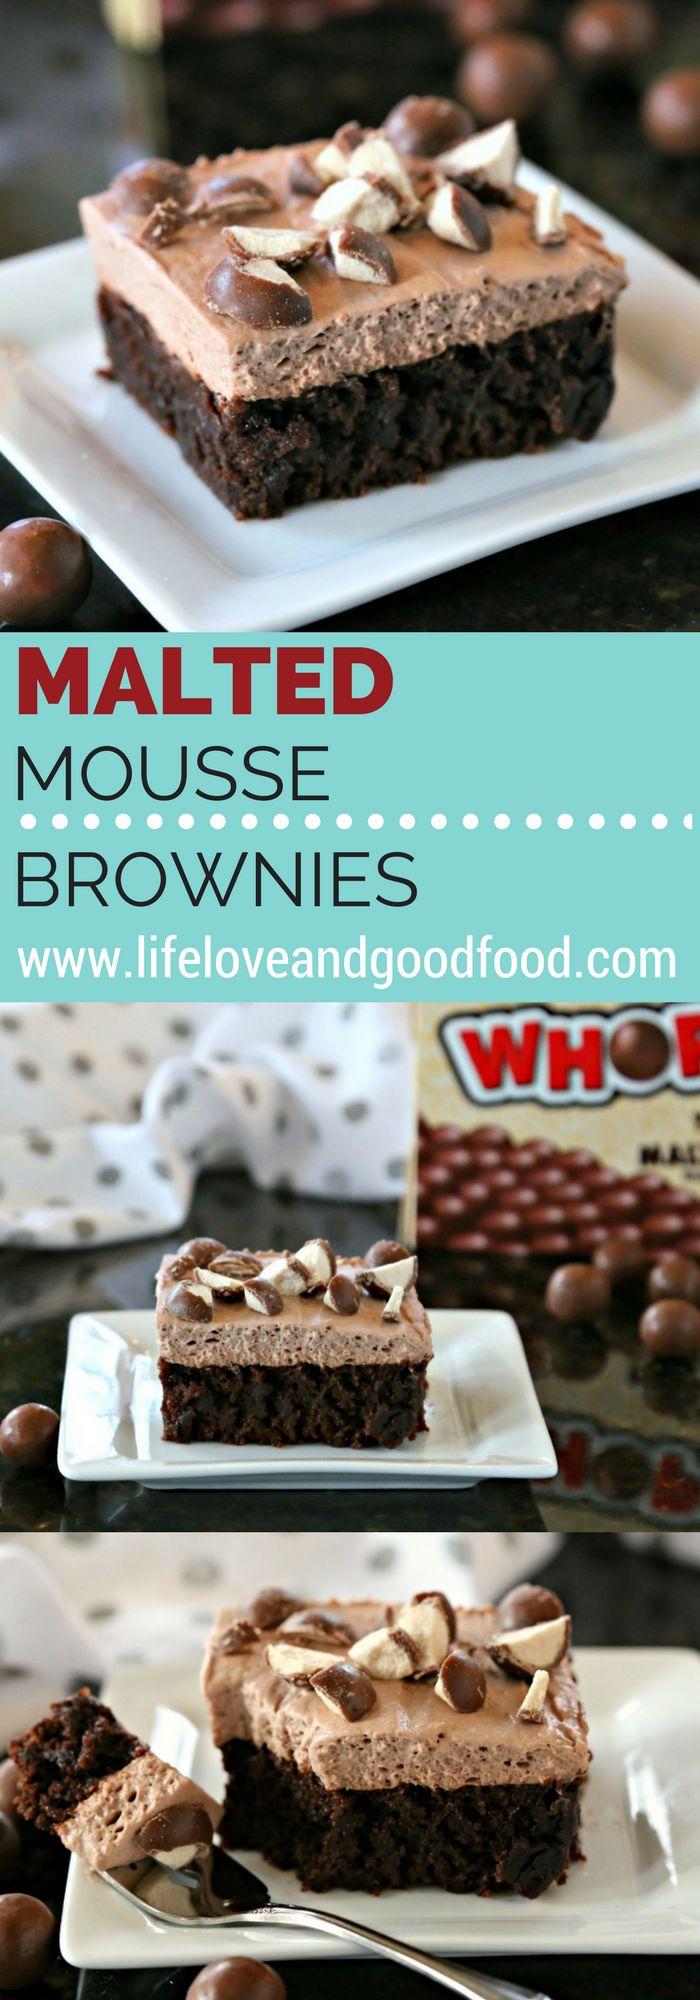 1473 best Cookies, Brownies and Bars images on Pinterest | Cookies ...